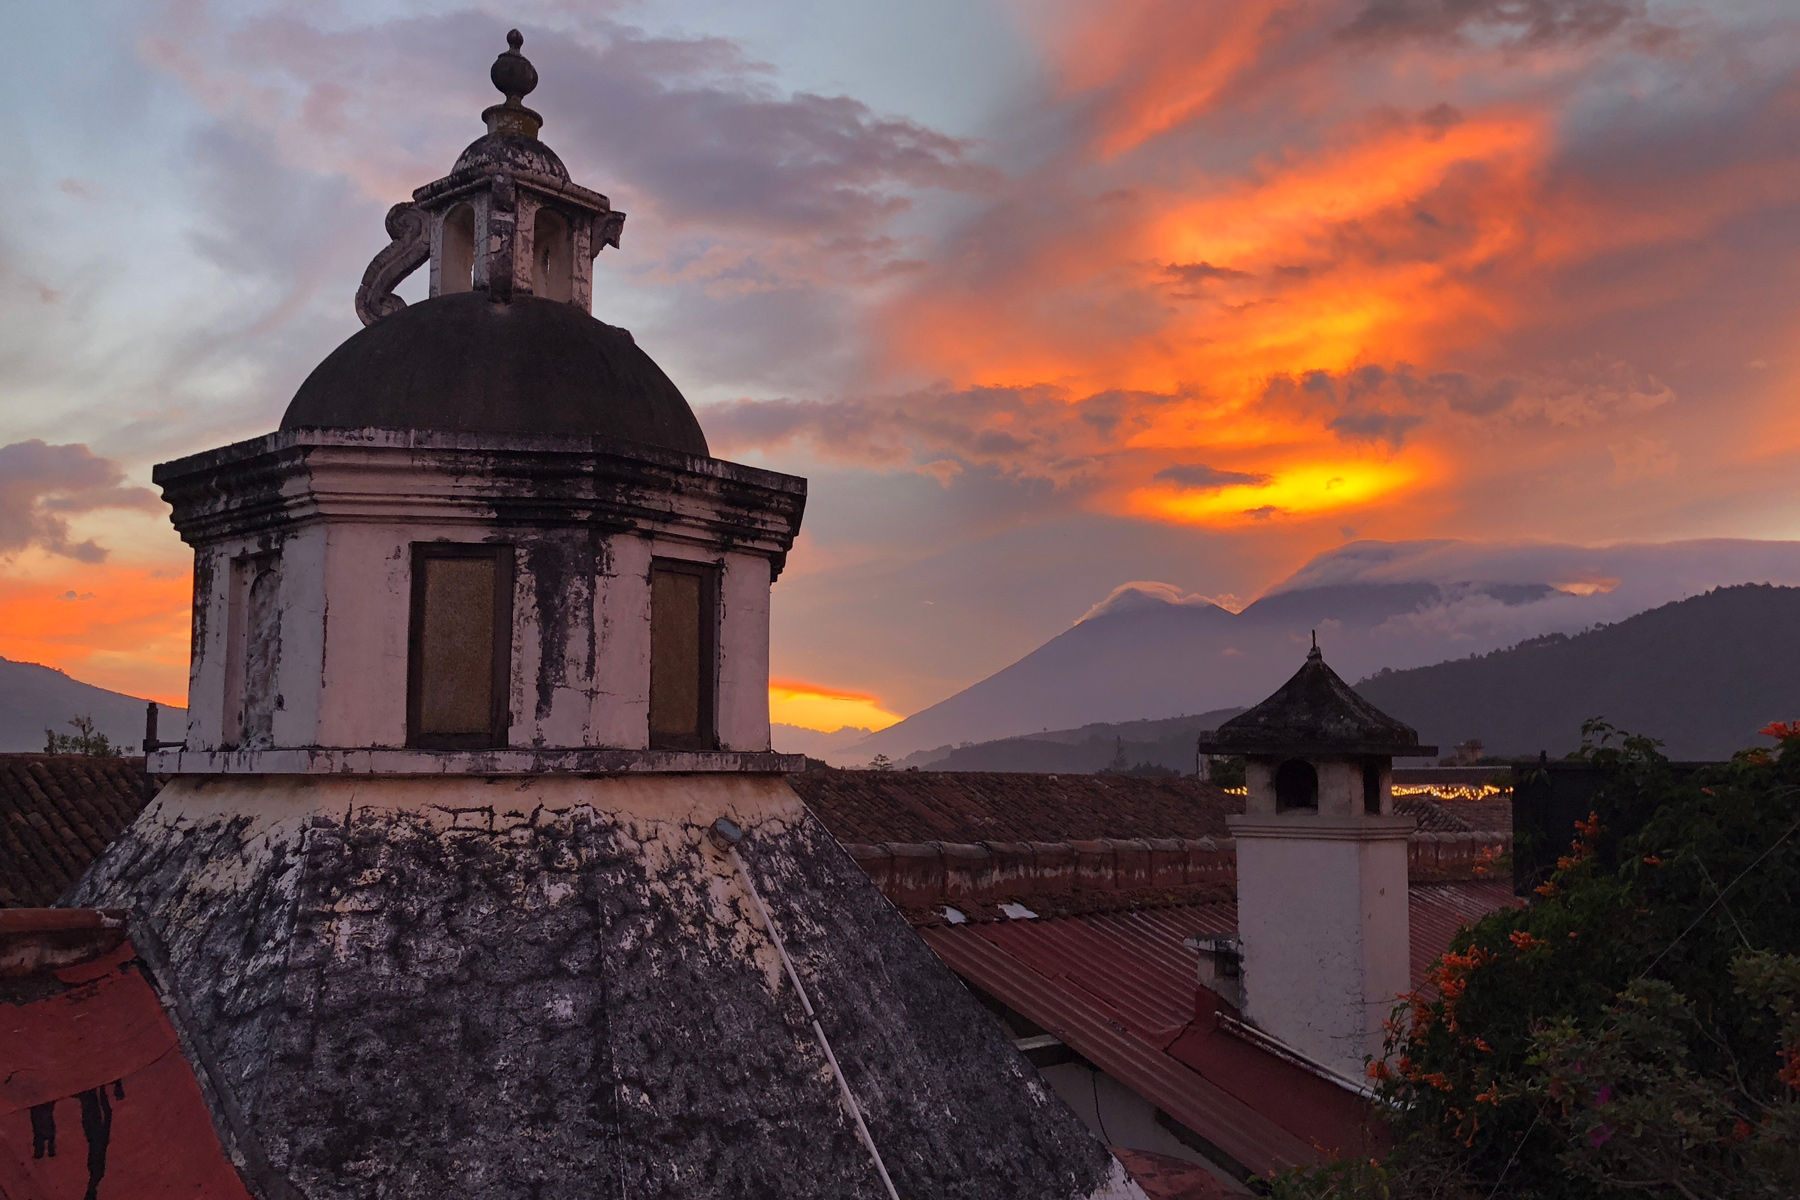 Foto hecha por Austin Mann en Guatemala con un iPhone X